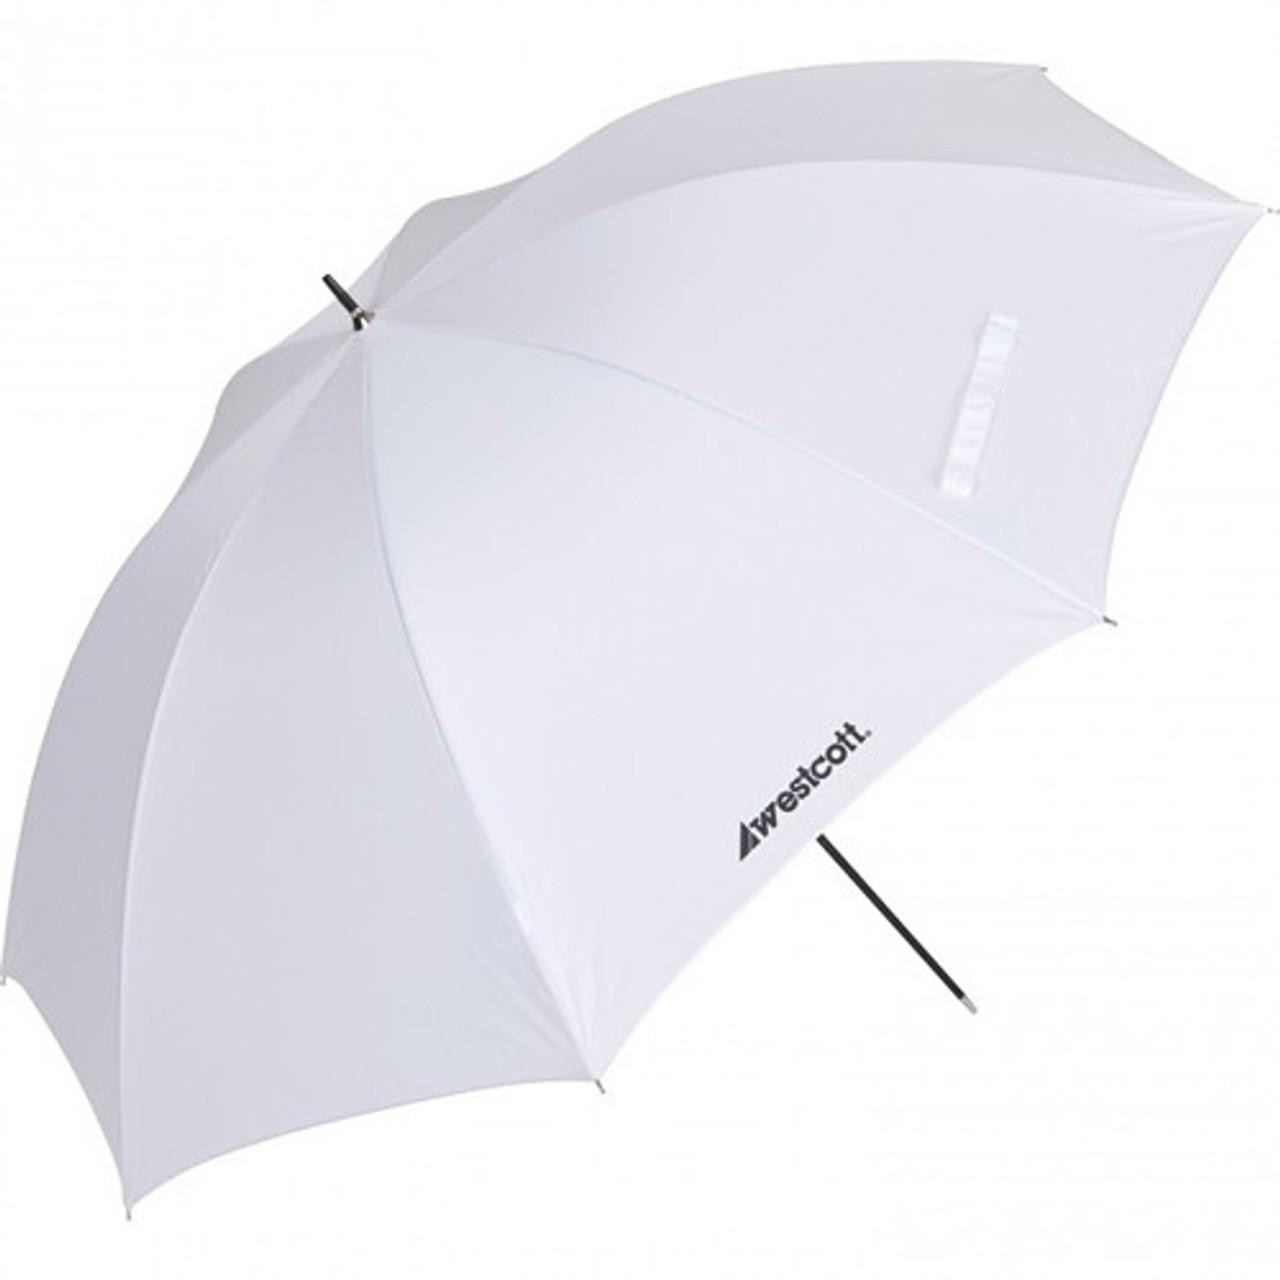 White Soft Umbrella 43 by Ucland Flash Translucent White Soft Umbrella for Photography Video Studio